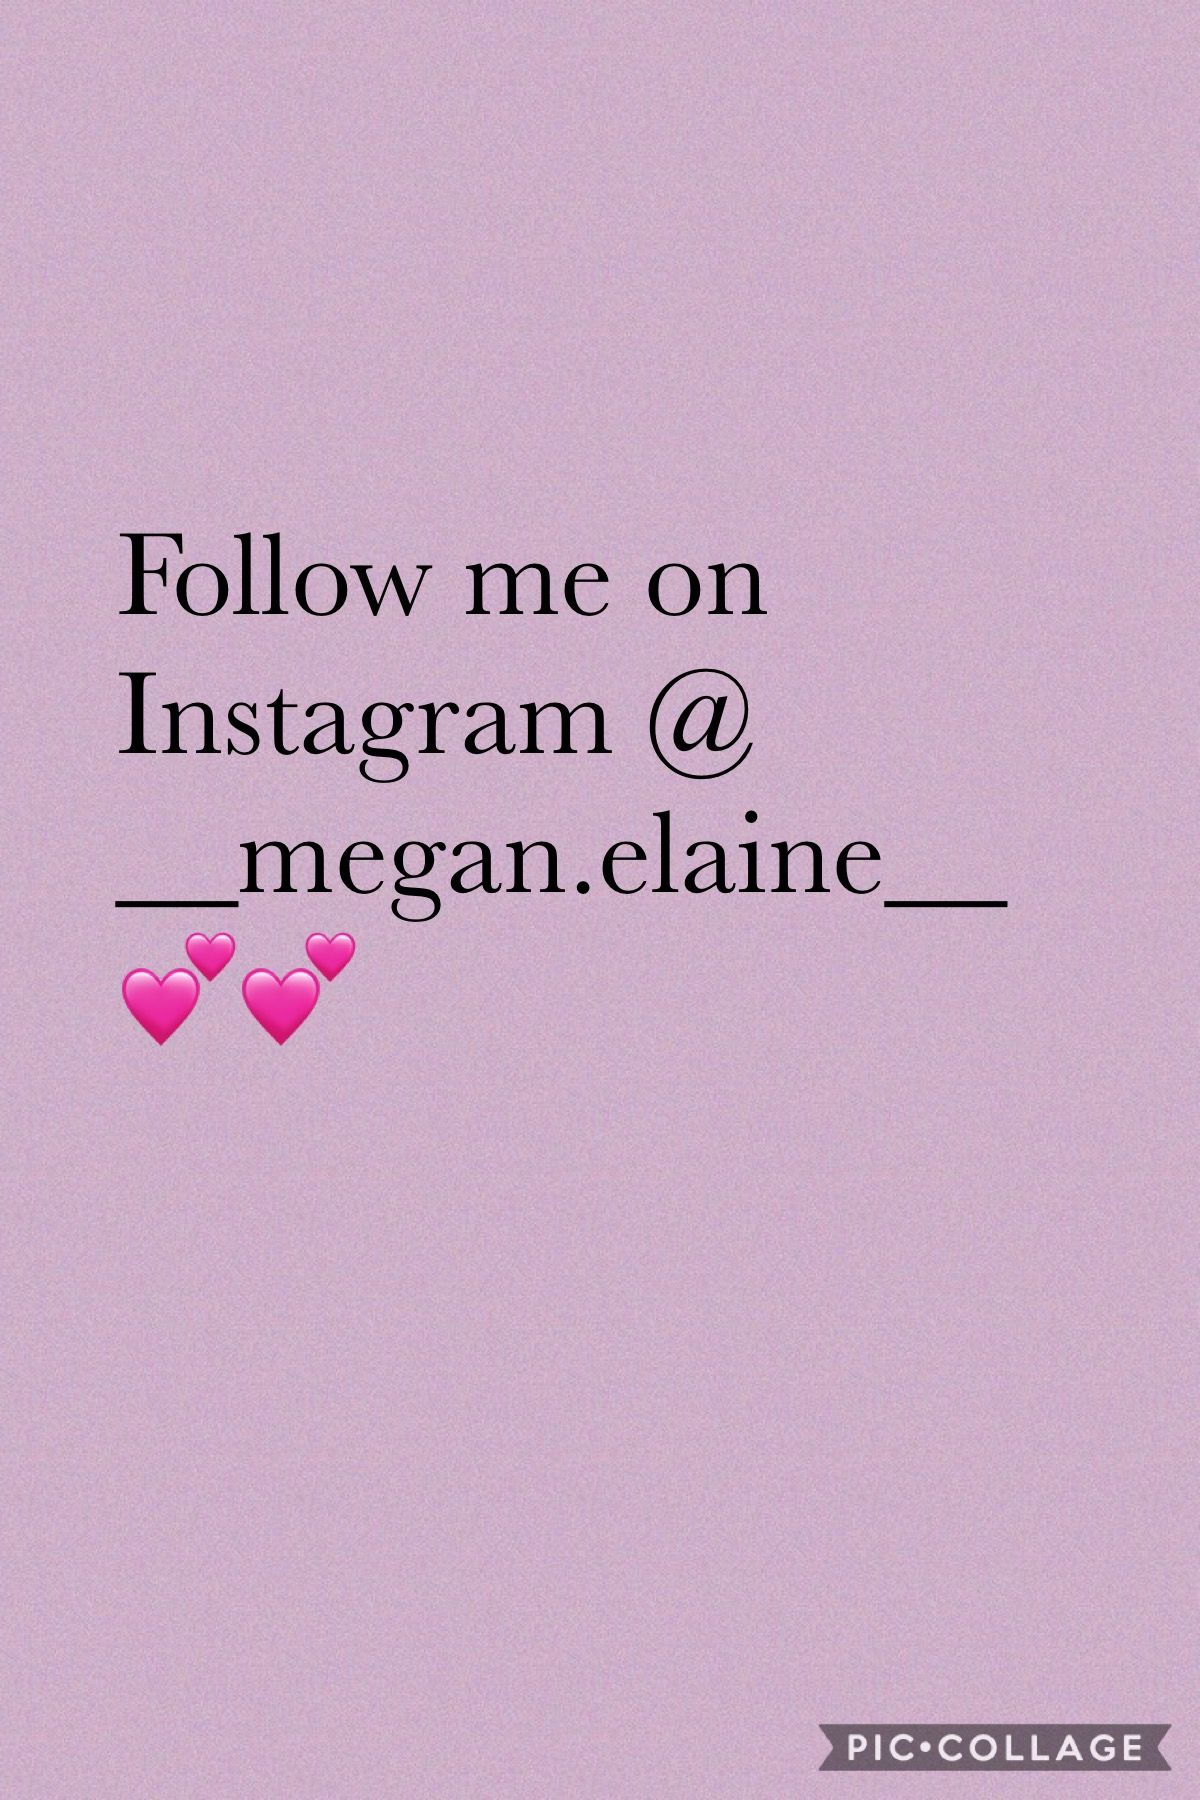 Follow me on Instagram and I'll follow back 💕 #followme #instagram